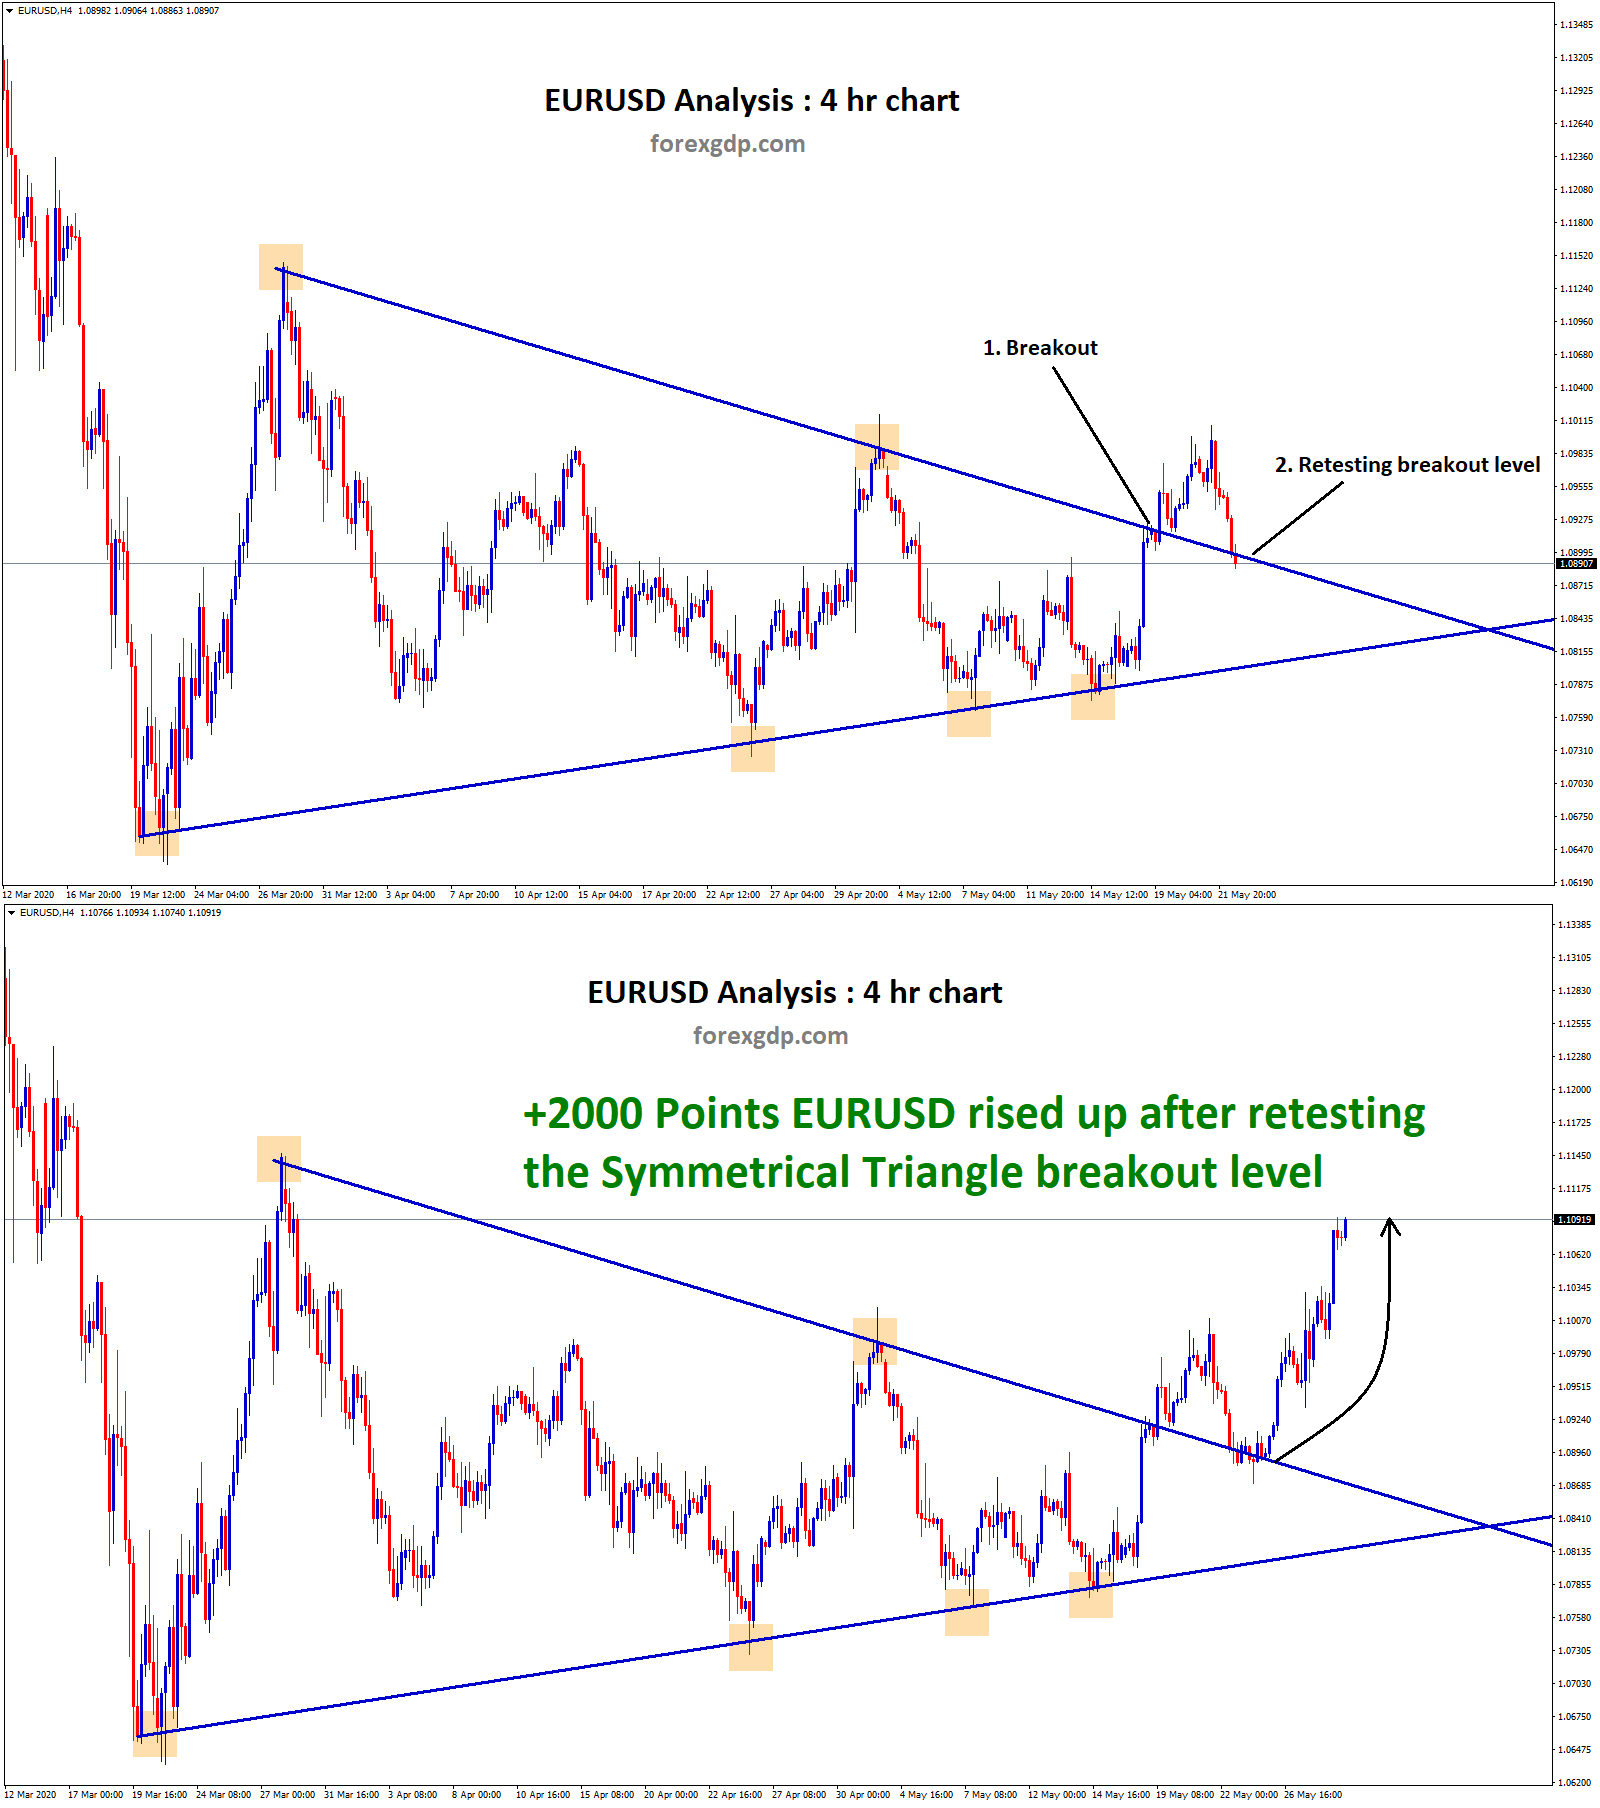 EURUSD Symmetrical triangle breakout and retesting occurs 1